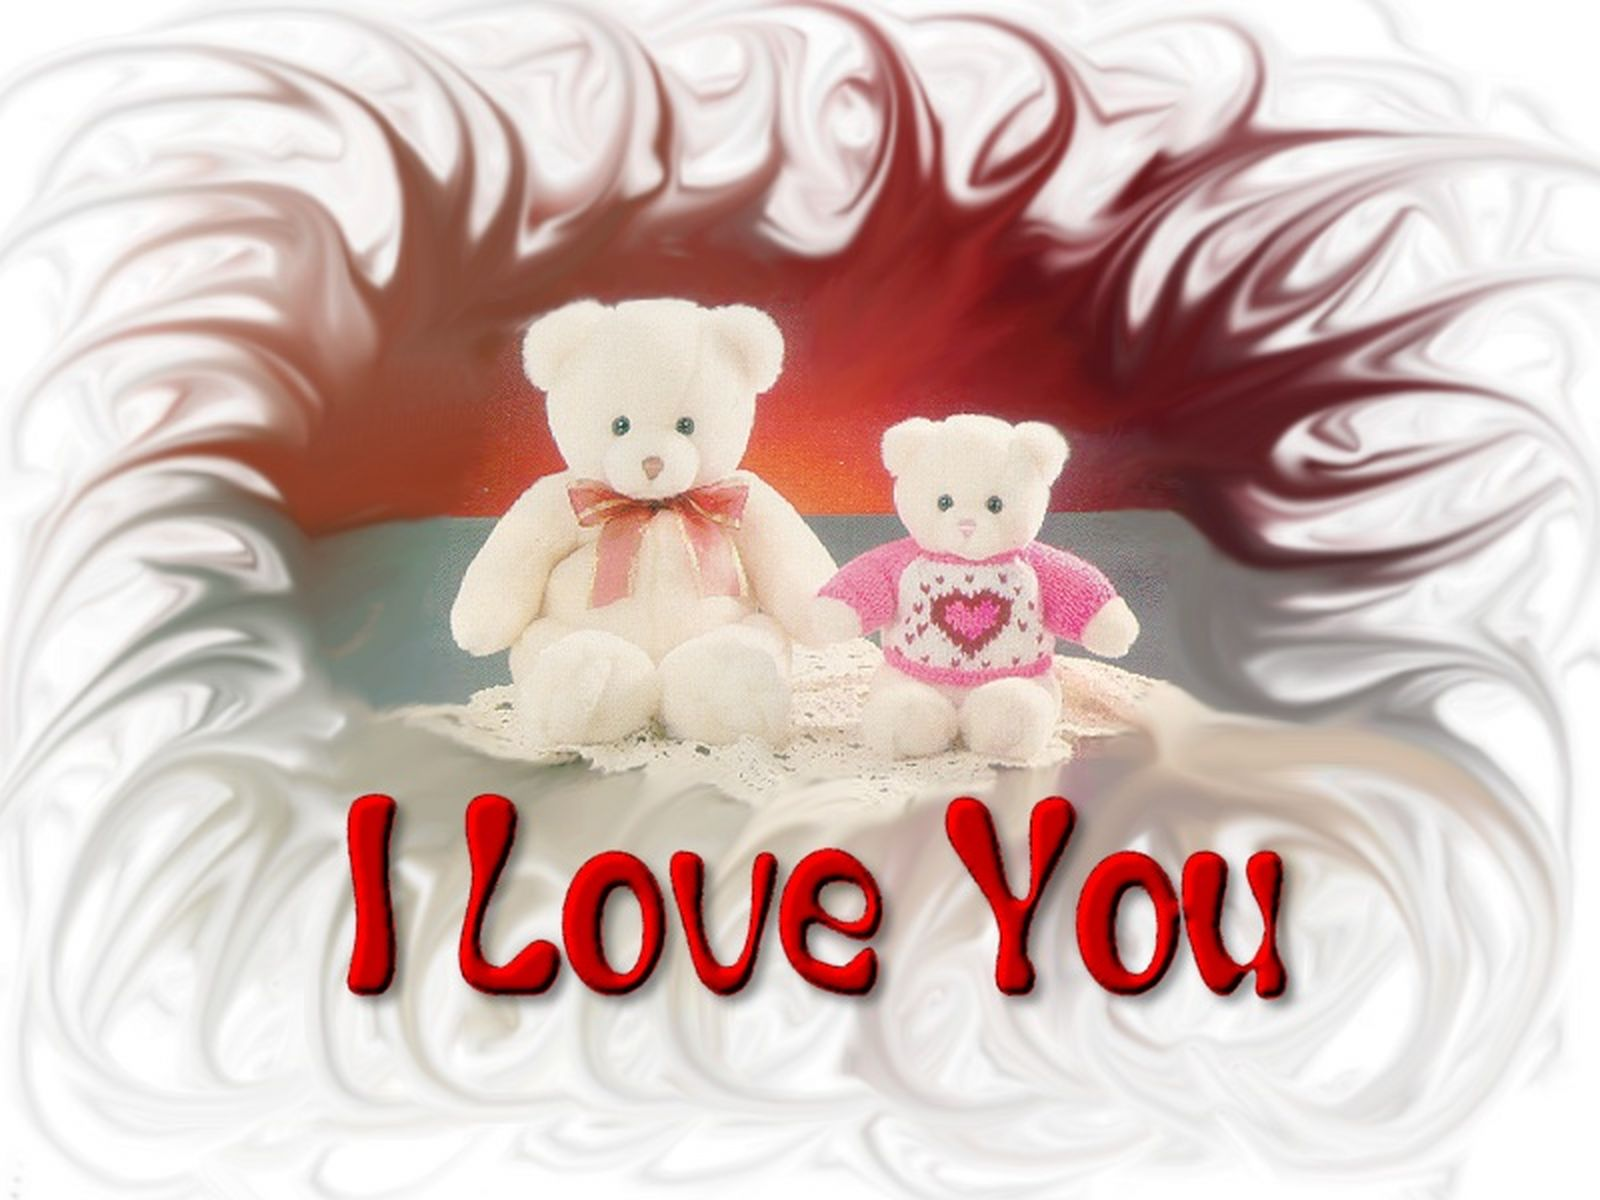 http://1.bp.blogspot.com/-GTWVVblSbRE/TbBrsdEZAQI/AAAAAAAAAlo/UvOKDxNJ7e8/s1600/47-Love%252528www.Fun4uMobile.blogspot.com%252529.JPG